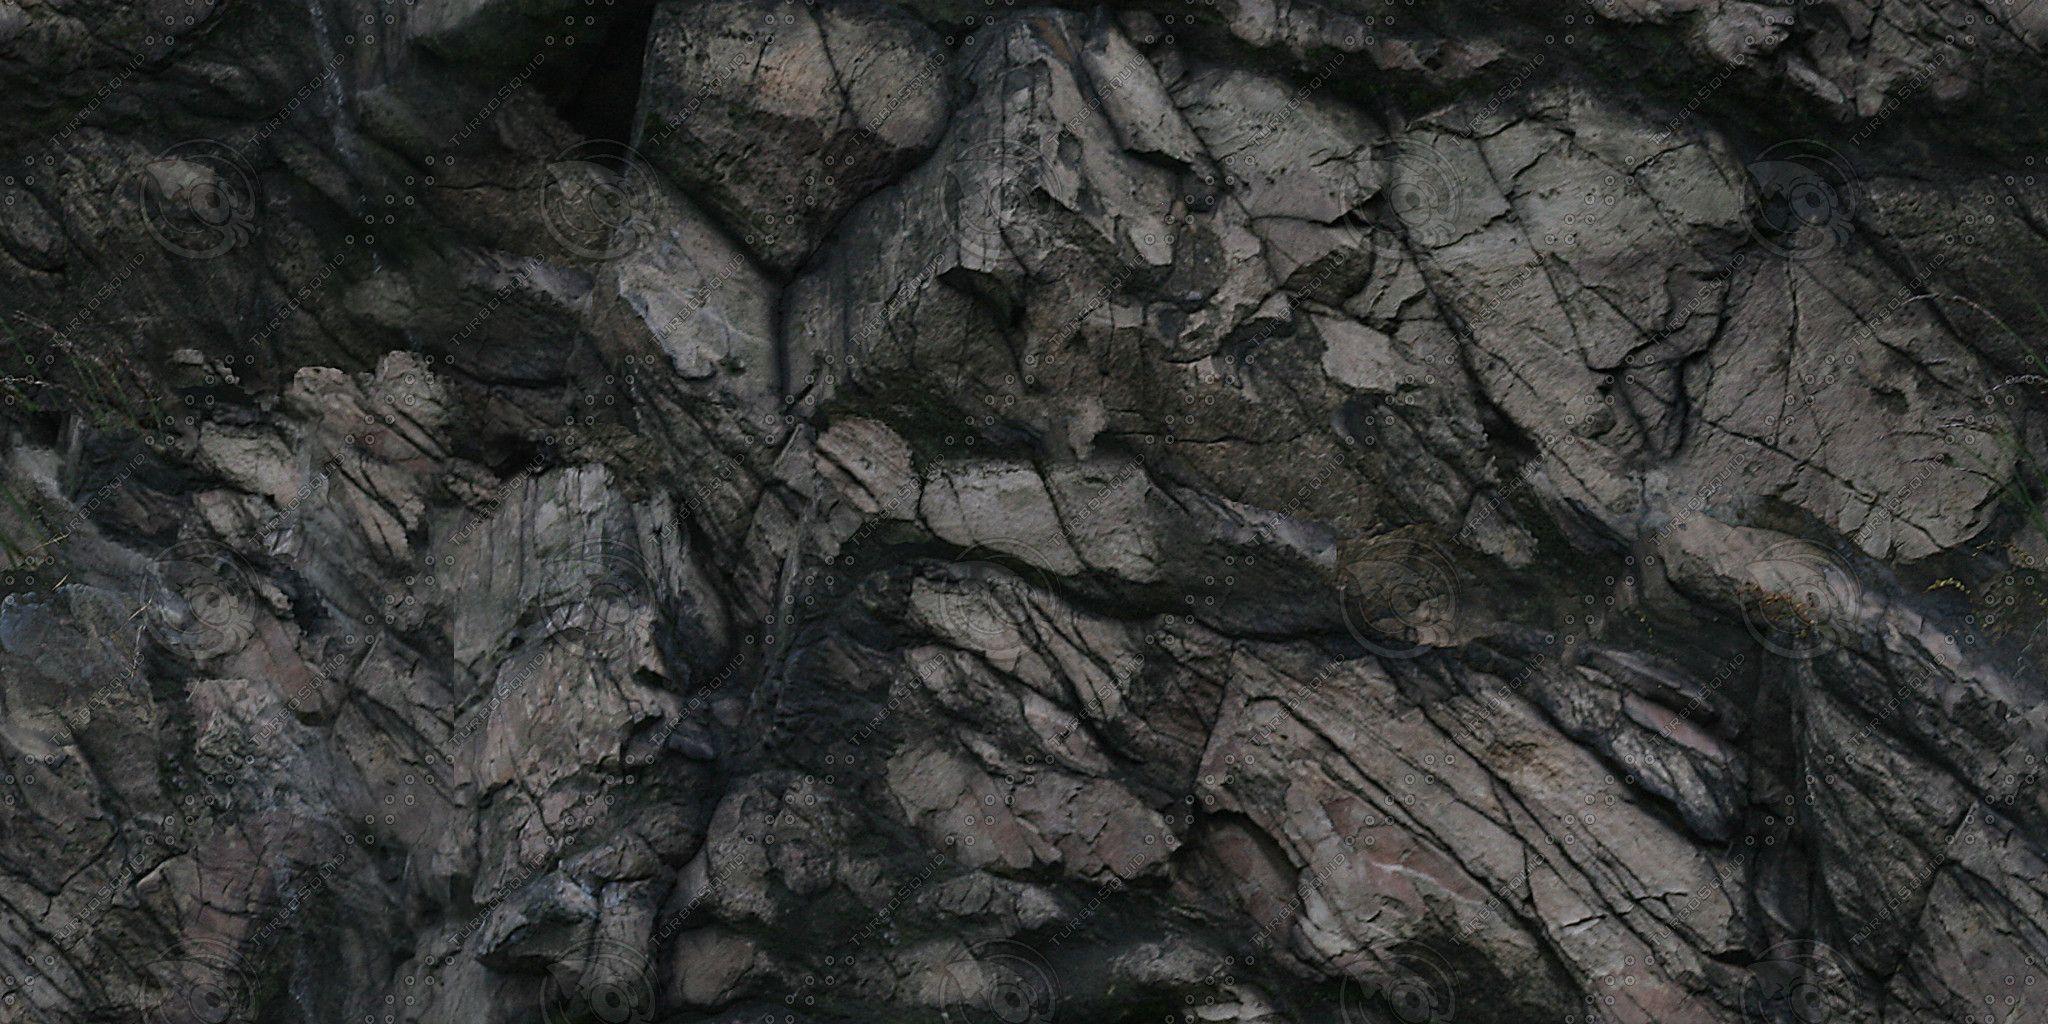 Black Rock, Textured Wallpaper, Rock Formations, Zbrush, Geology, Batu, Cliff